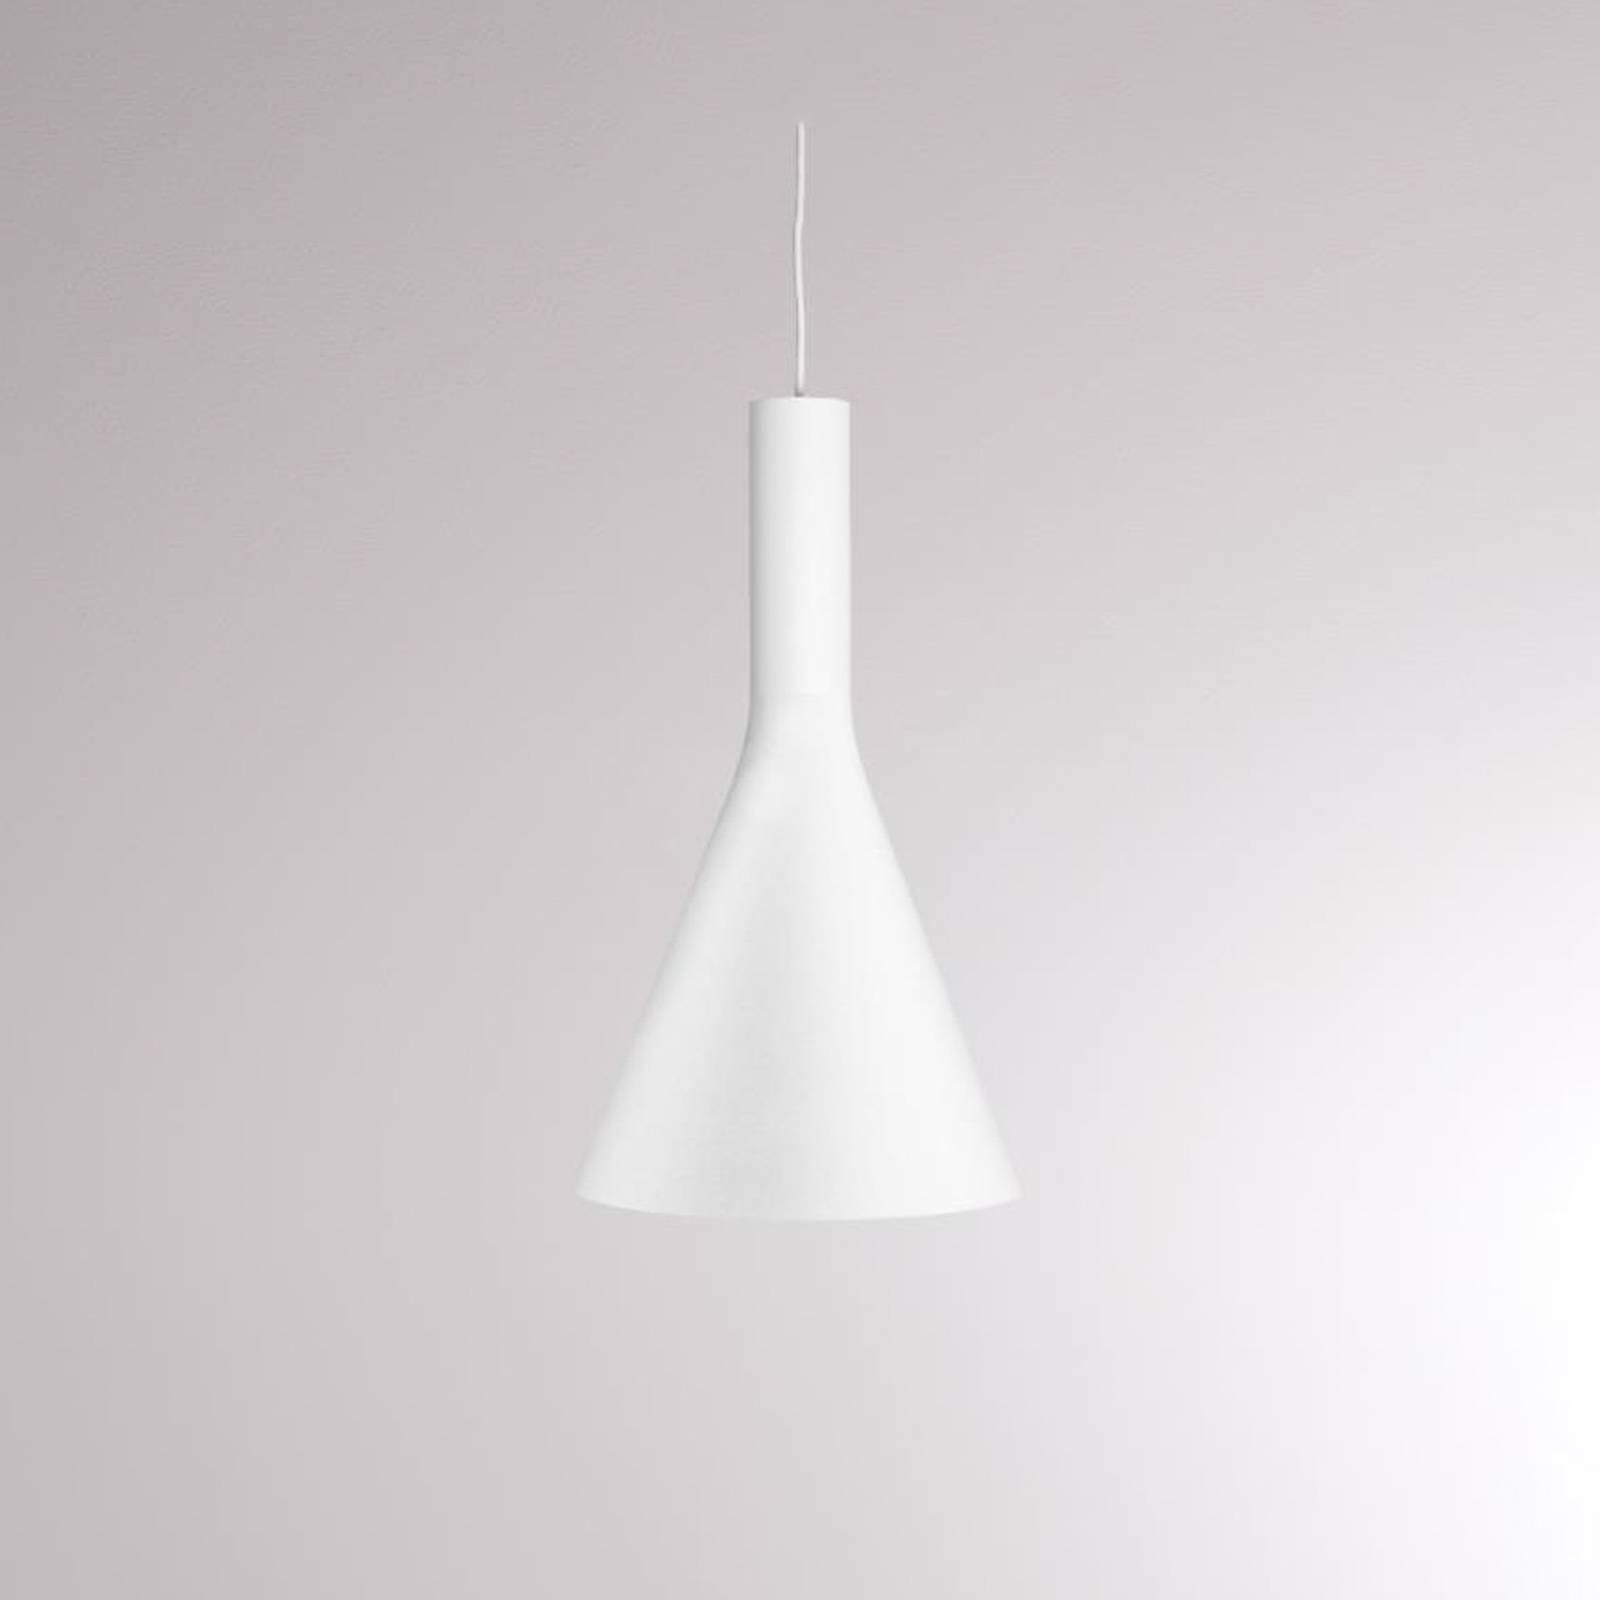 LOUM Lora Shade 1 suspension LED 2700K blanche